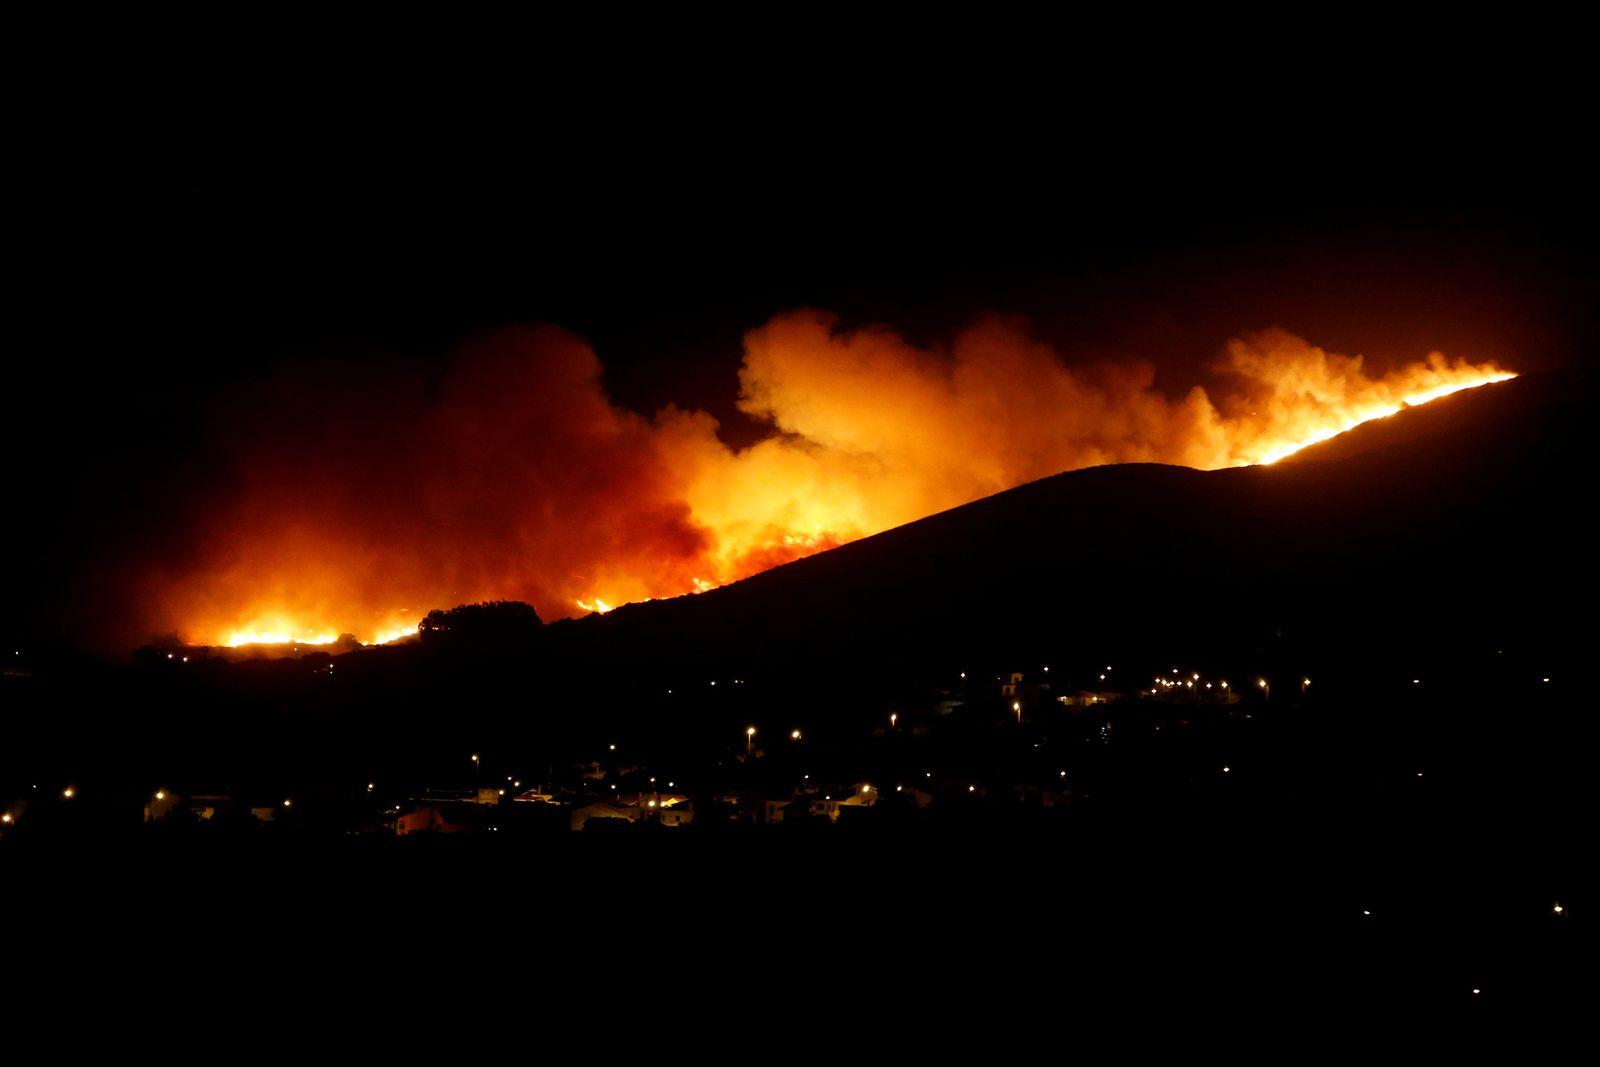 PORTUGAL-FIRE/